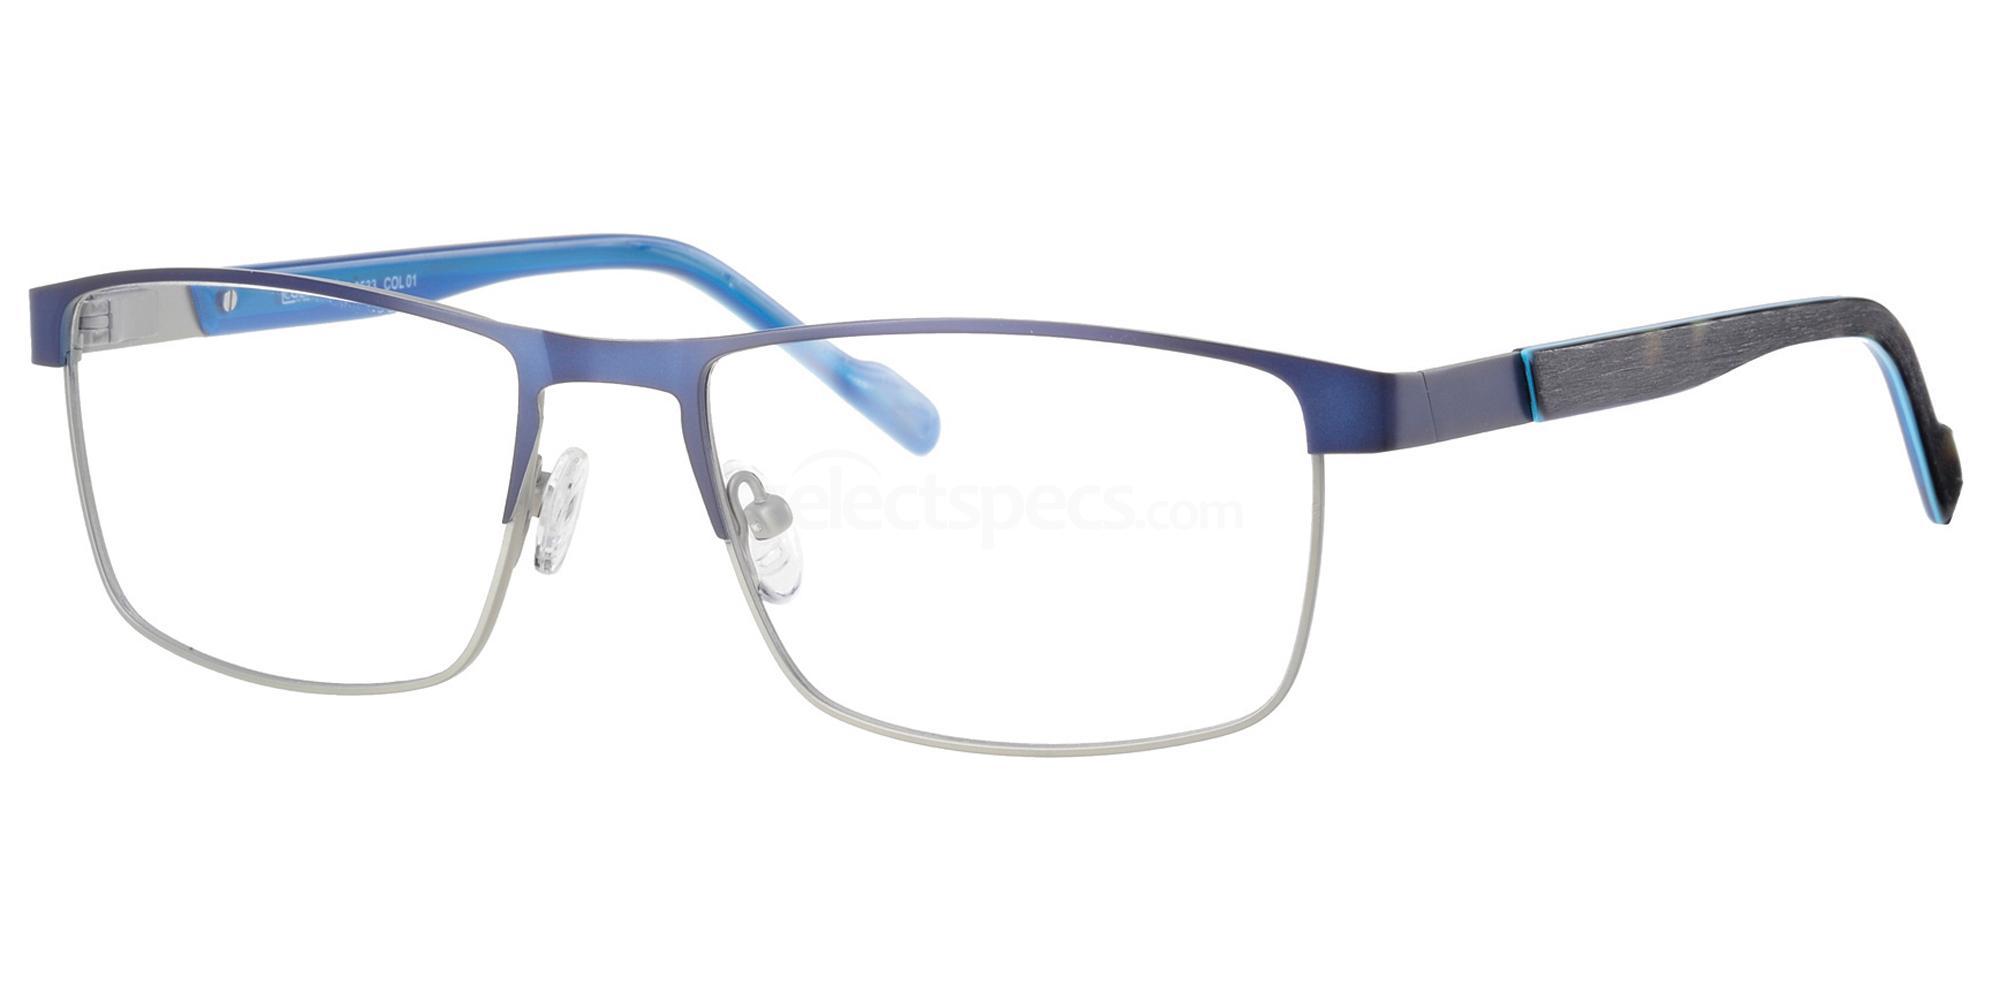 C01 3533 Glasses, Colt for Men